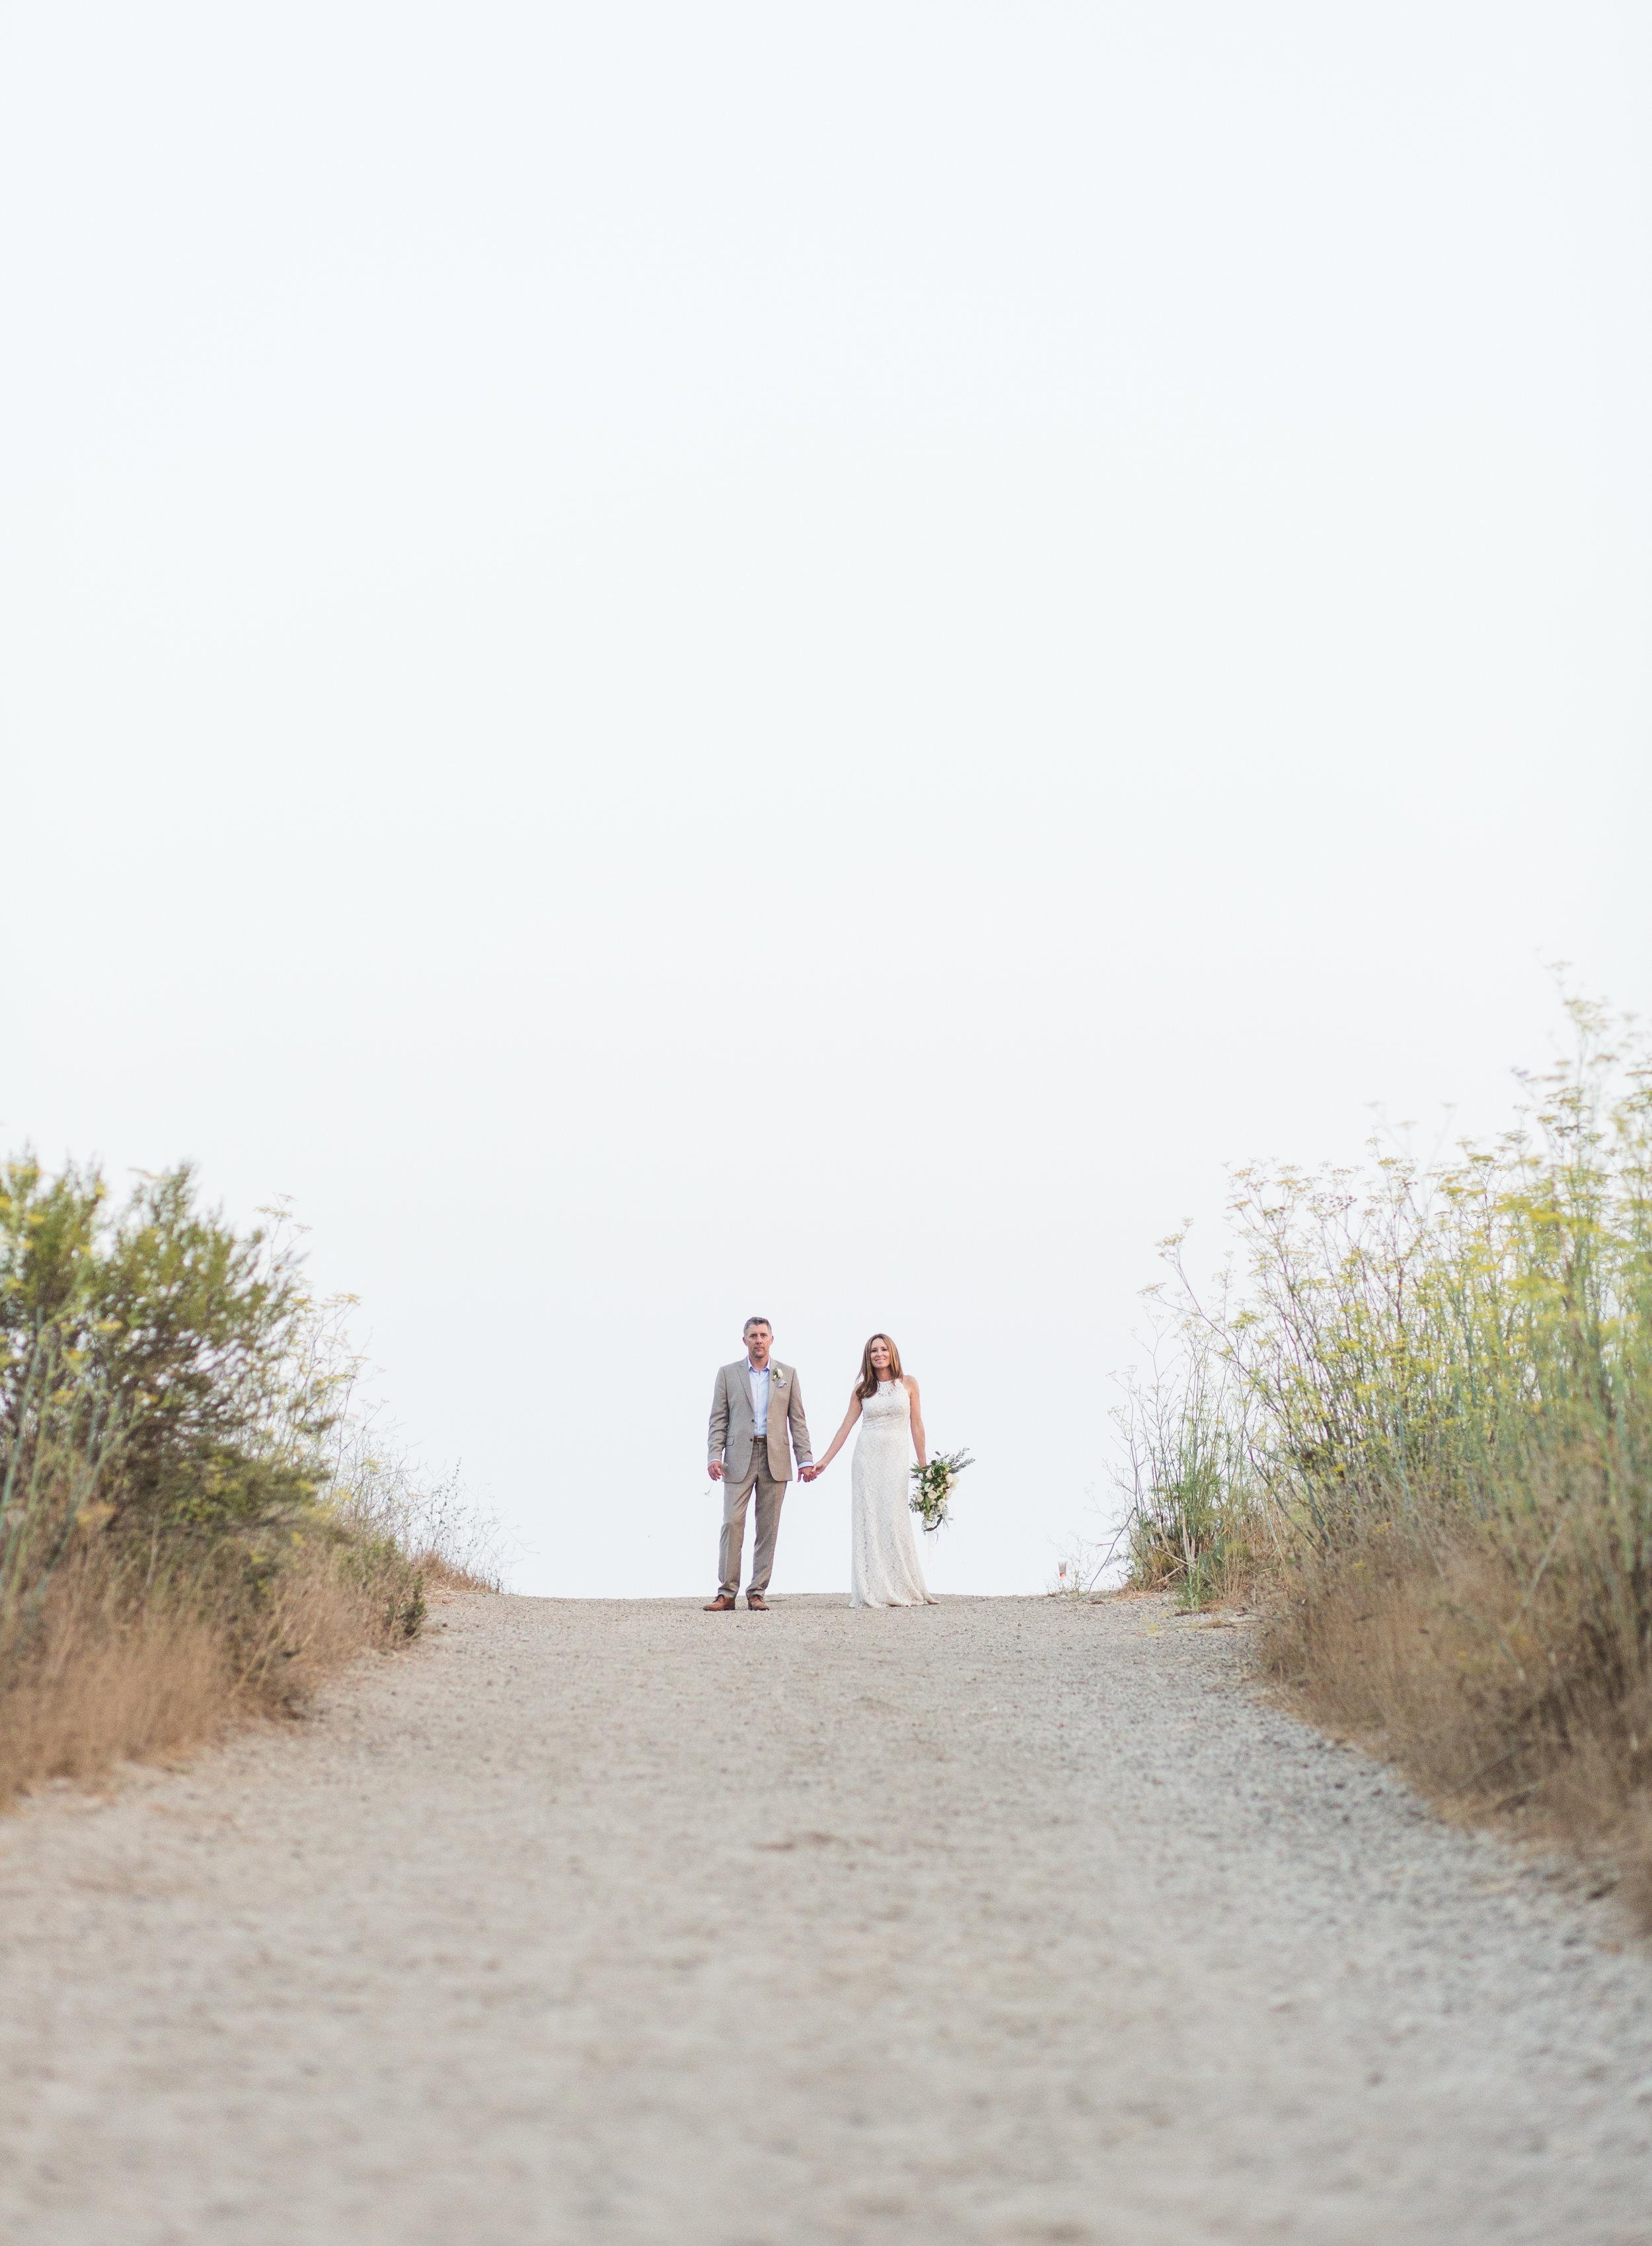 santa-barbara-elopement-elope-wedding-planner-coordinator-coordination-day-of-intimate-rustic-ellwood-bluffs-forest-beach-ocean-view-green-white-event (21).jpg